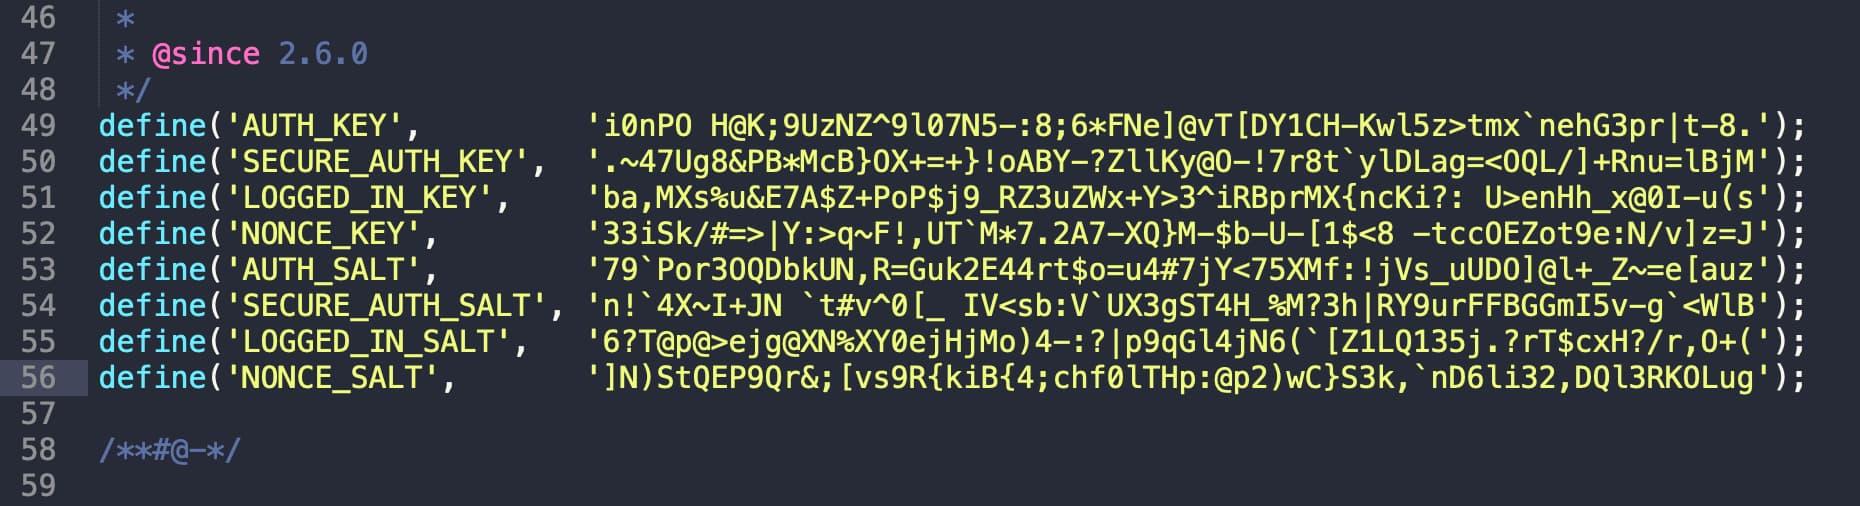 WordPress autentiserings-nycklar